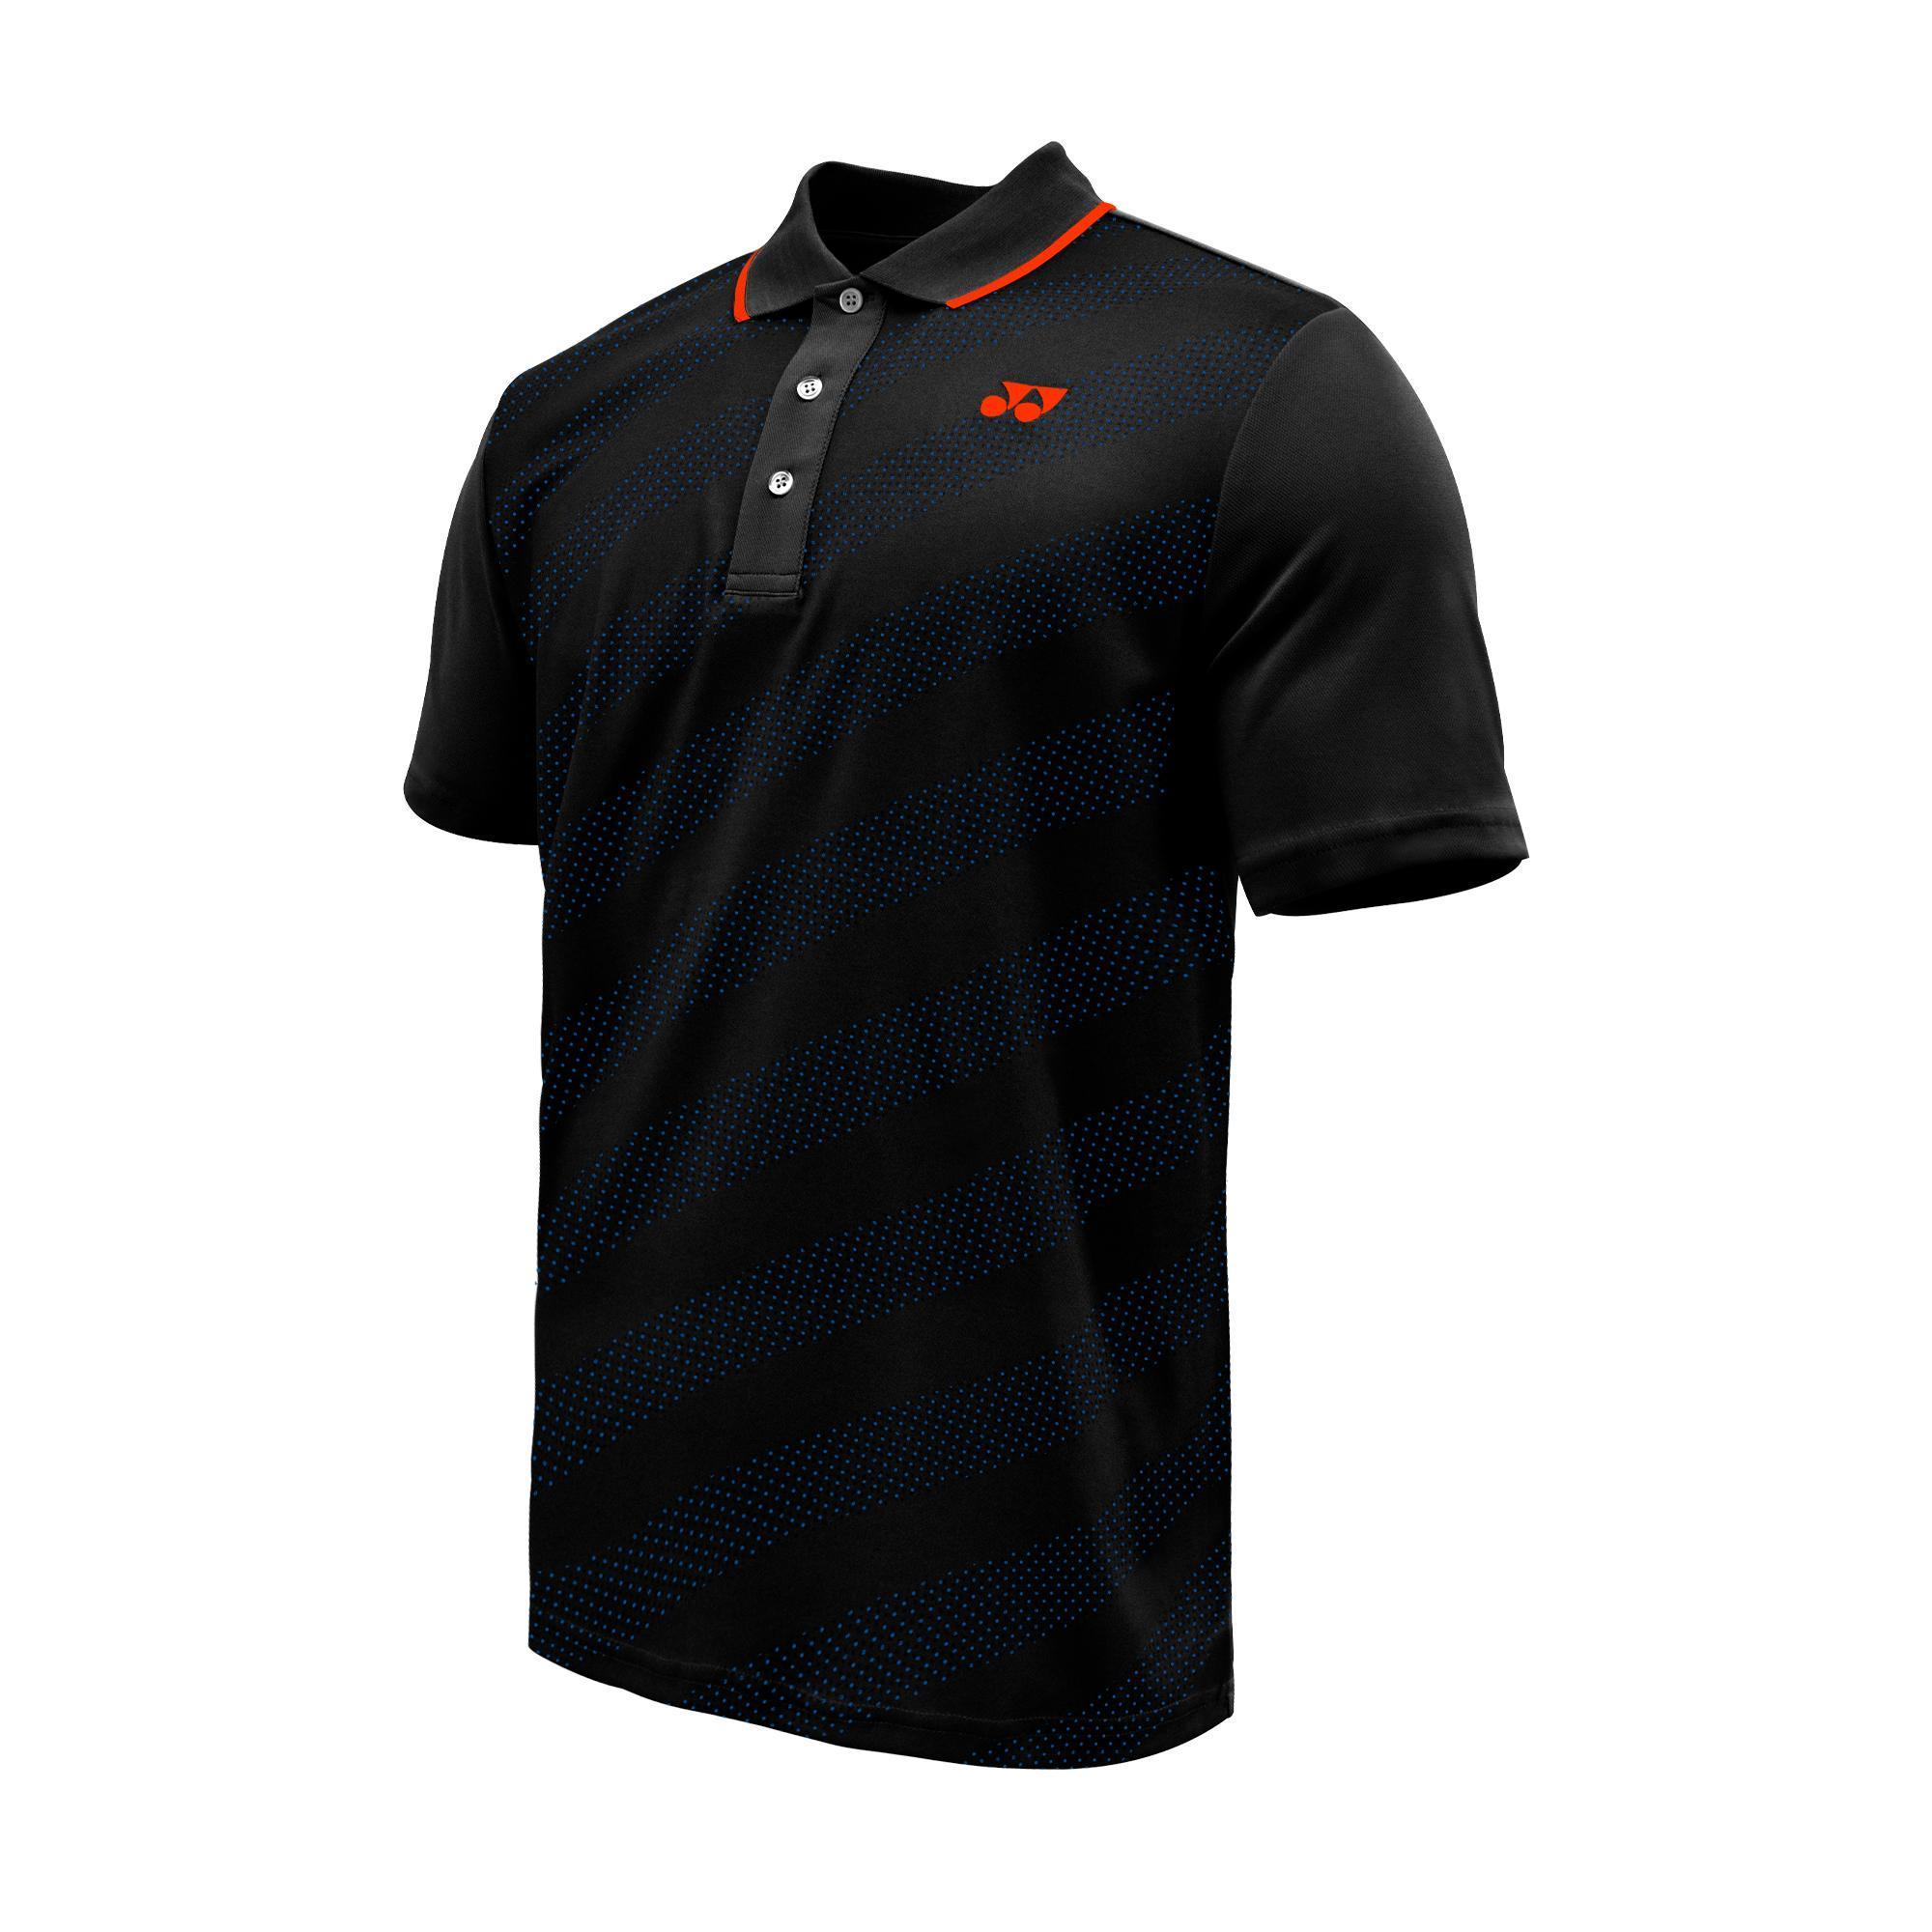 Yonex Baju Polo Olahraga Pria - Tpm896Vl28Tz